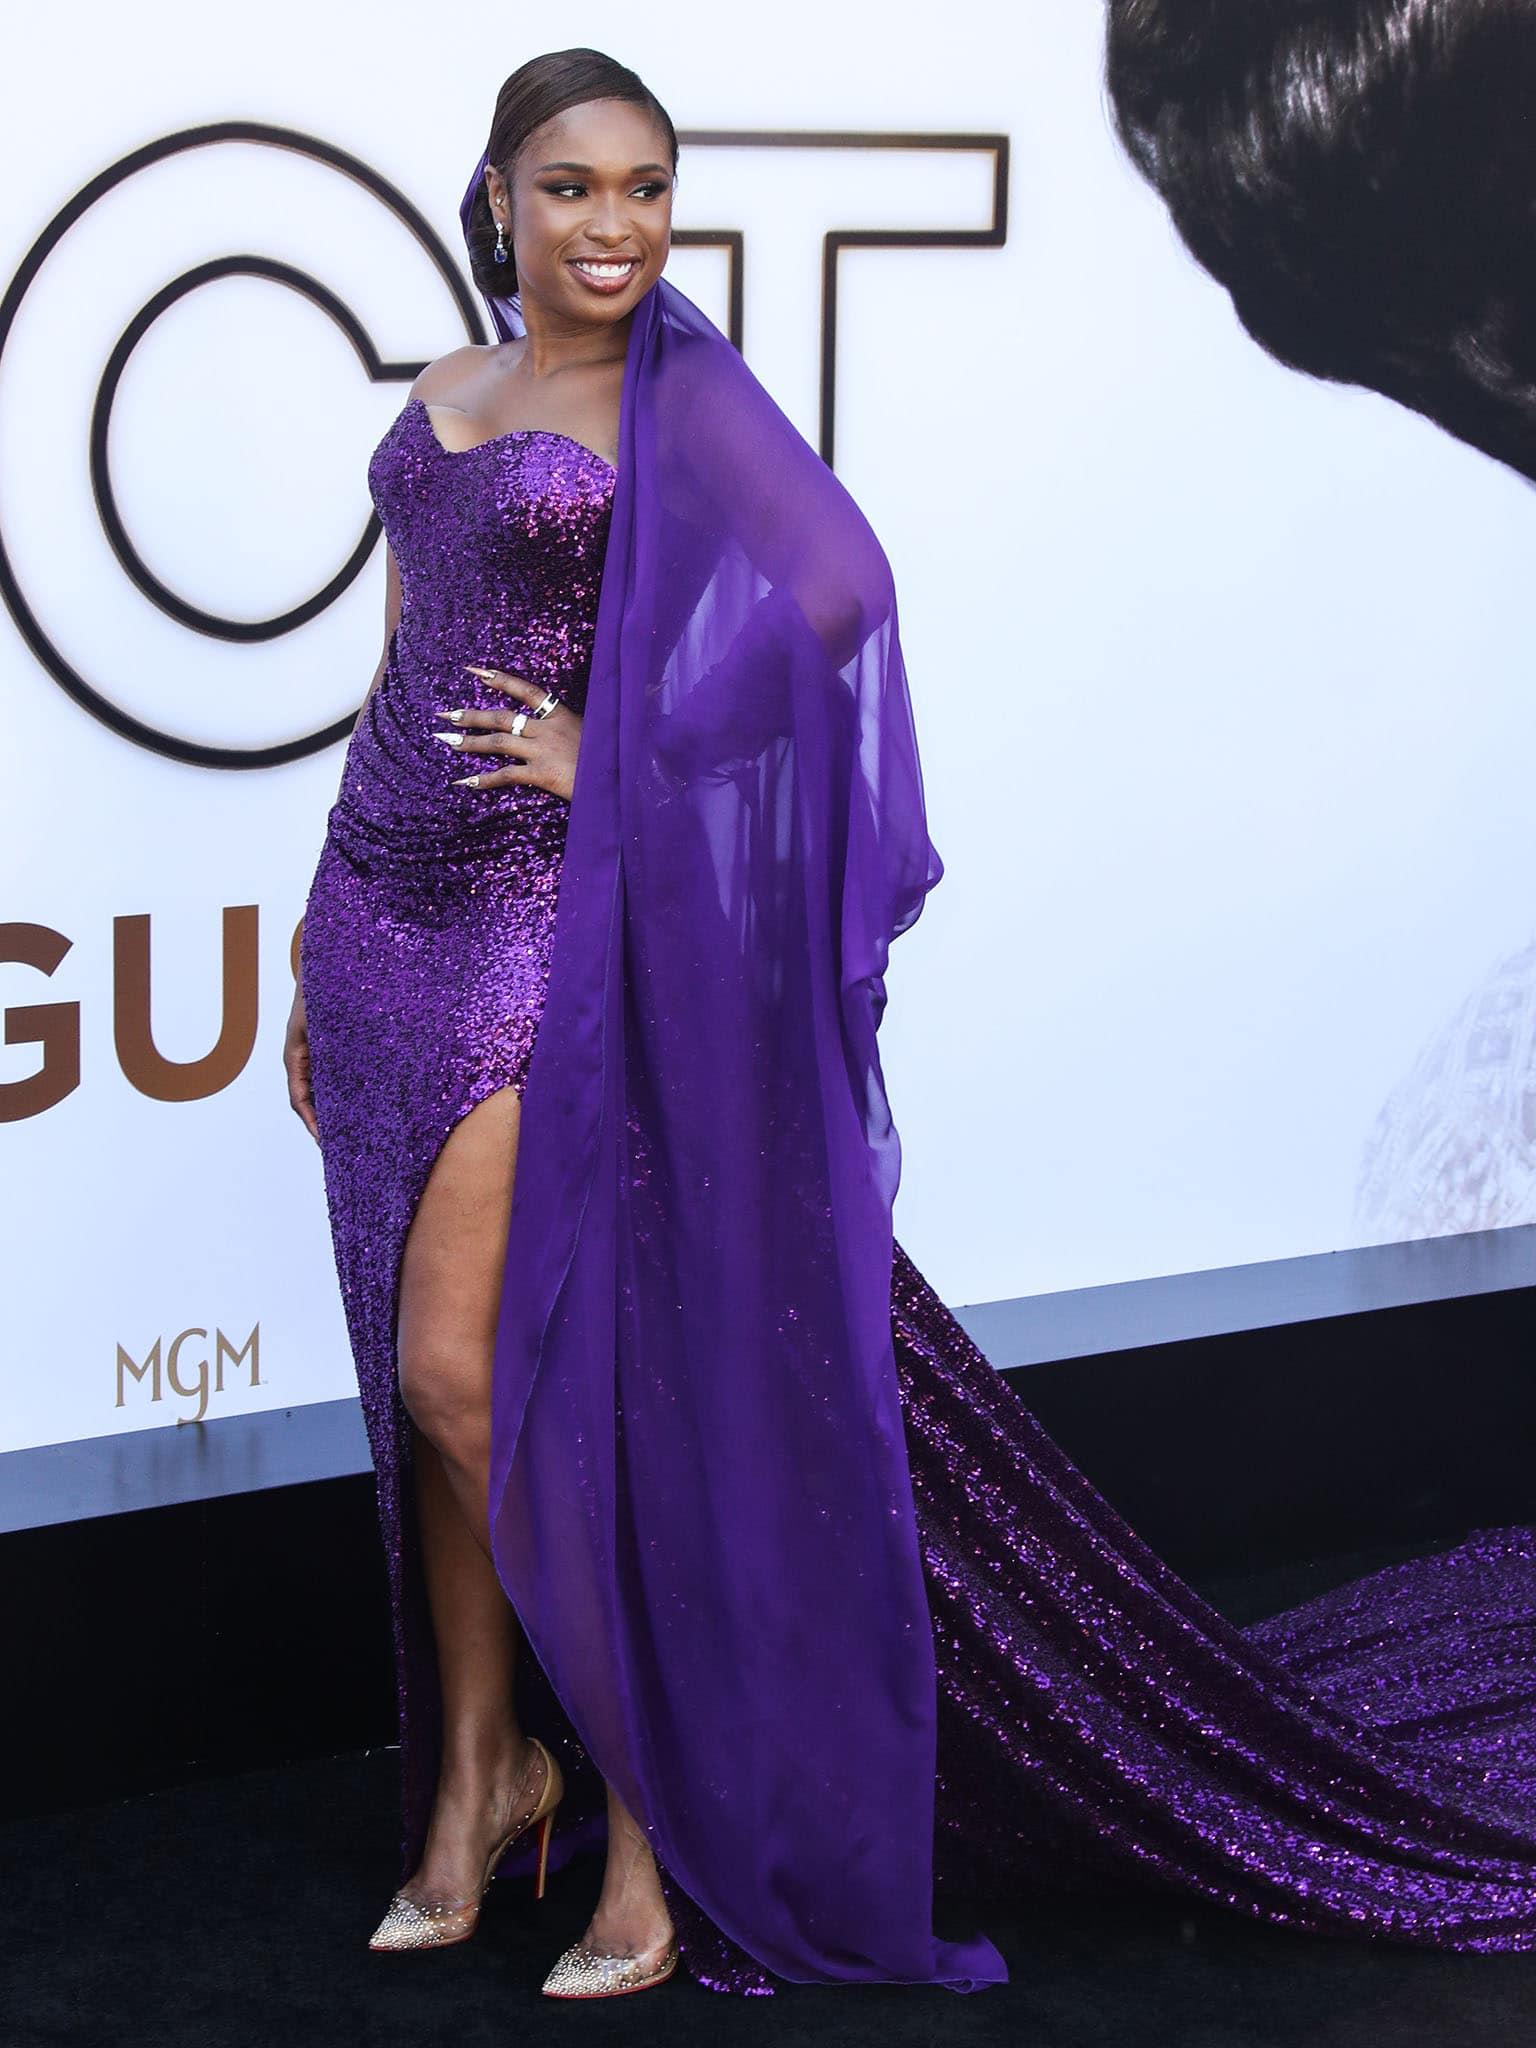 Jennifer Hudson stuns in Dolce & Gabbana purple sequined gown with a Jolleson chiffon veil